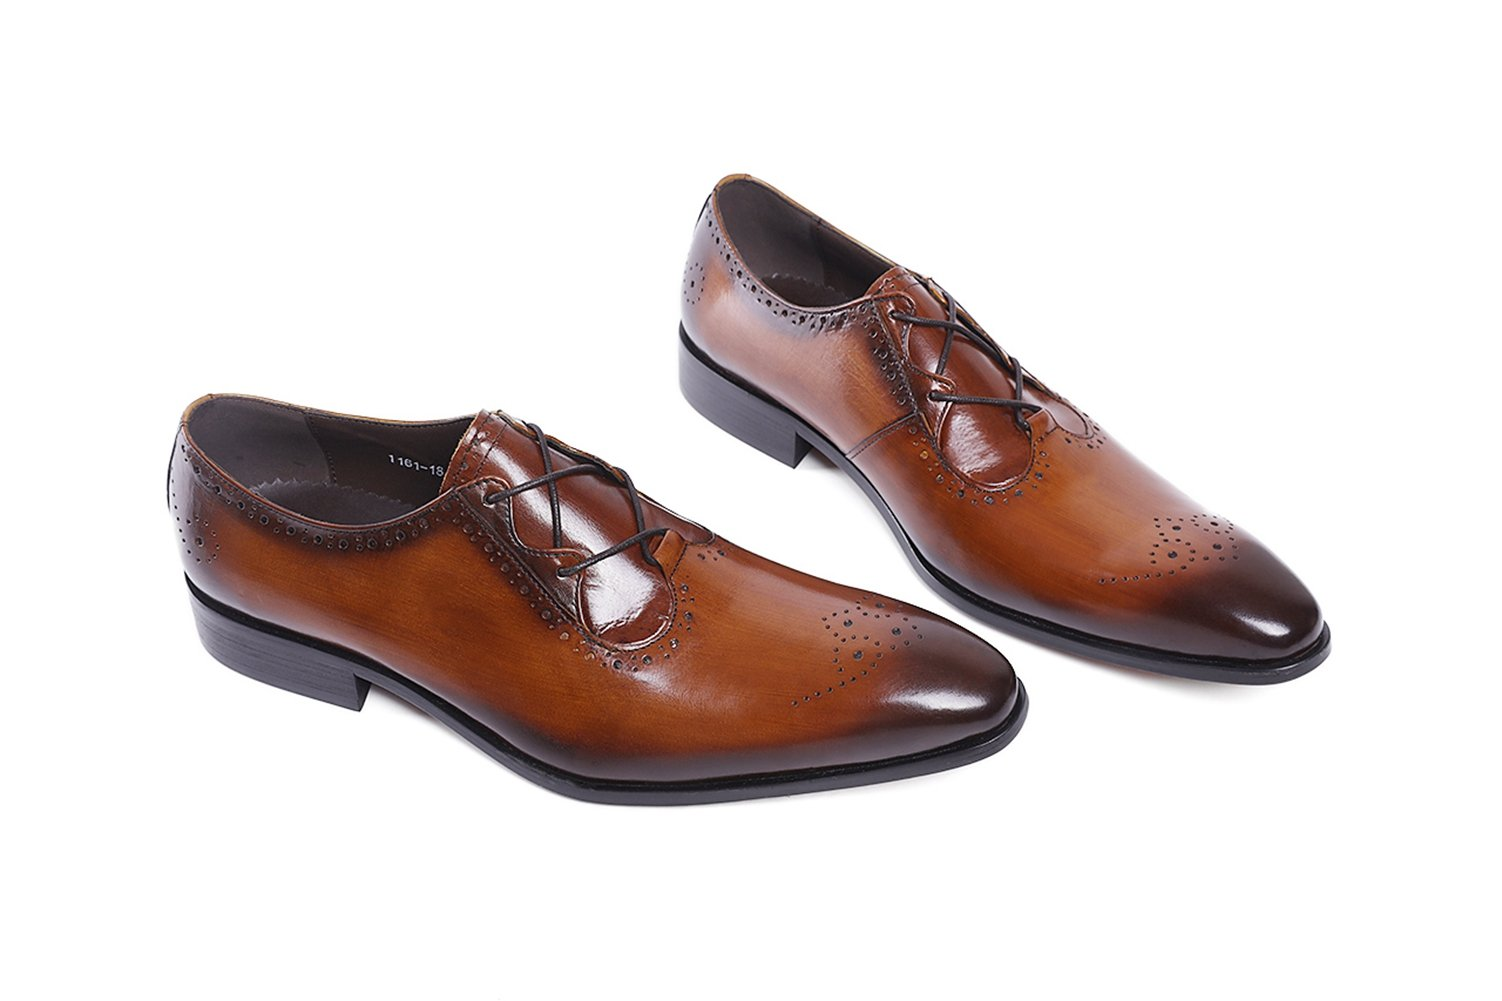 Felix Chu Men's Italian Designer Luxury Perfect Genuine Calf Leather shoes, Brown, 9 D(M) US by Felix Chu (Image #5)